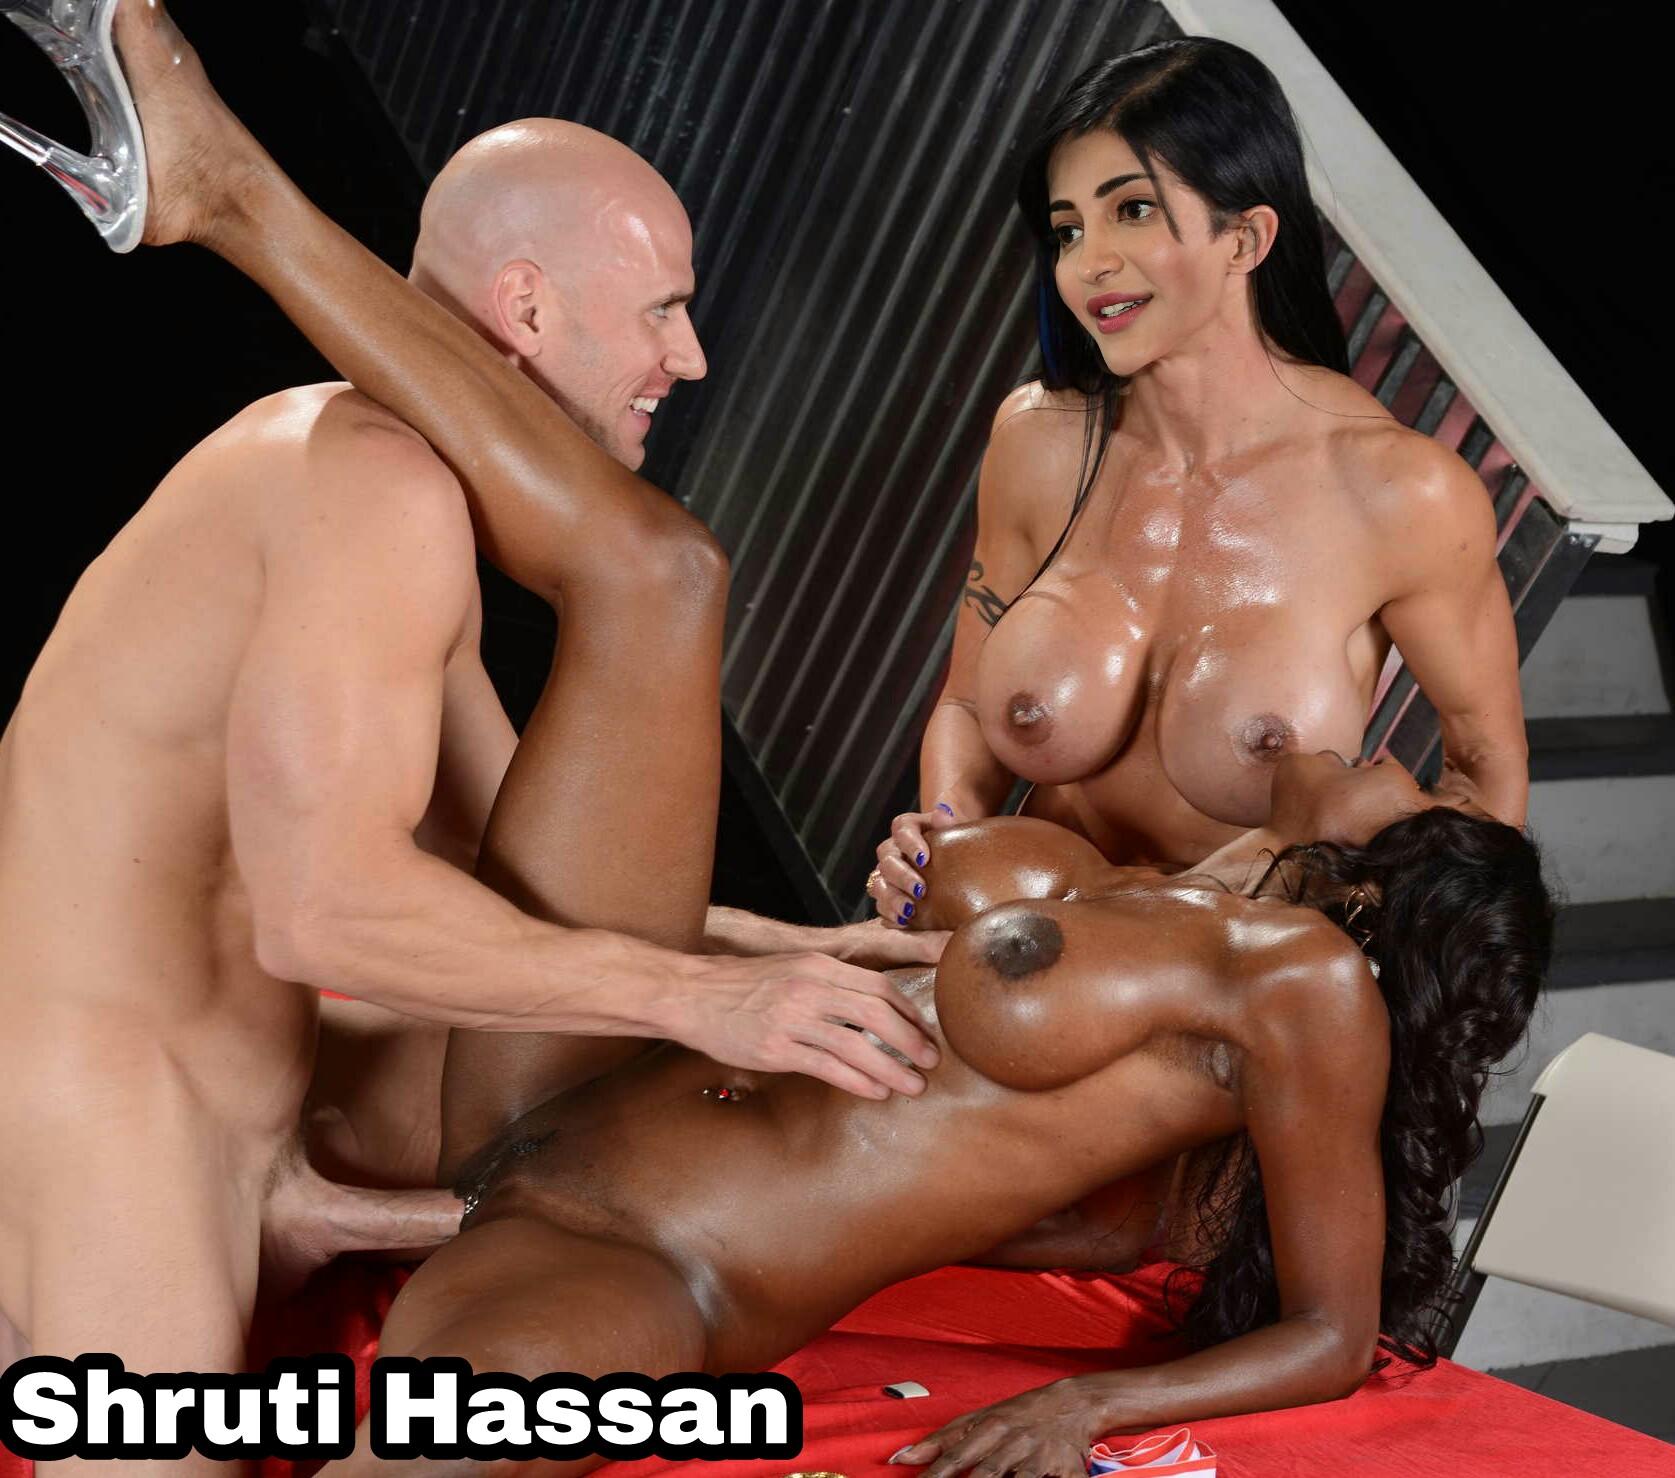 Hassan naddel fucking